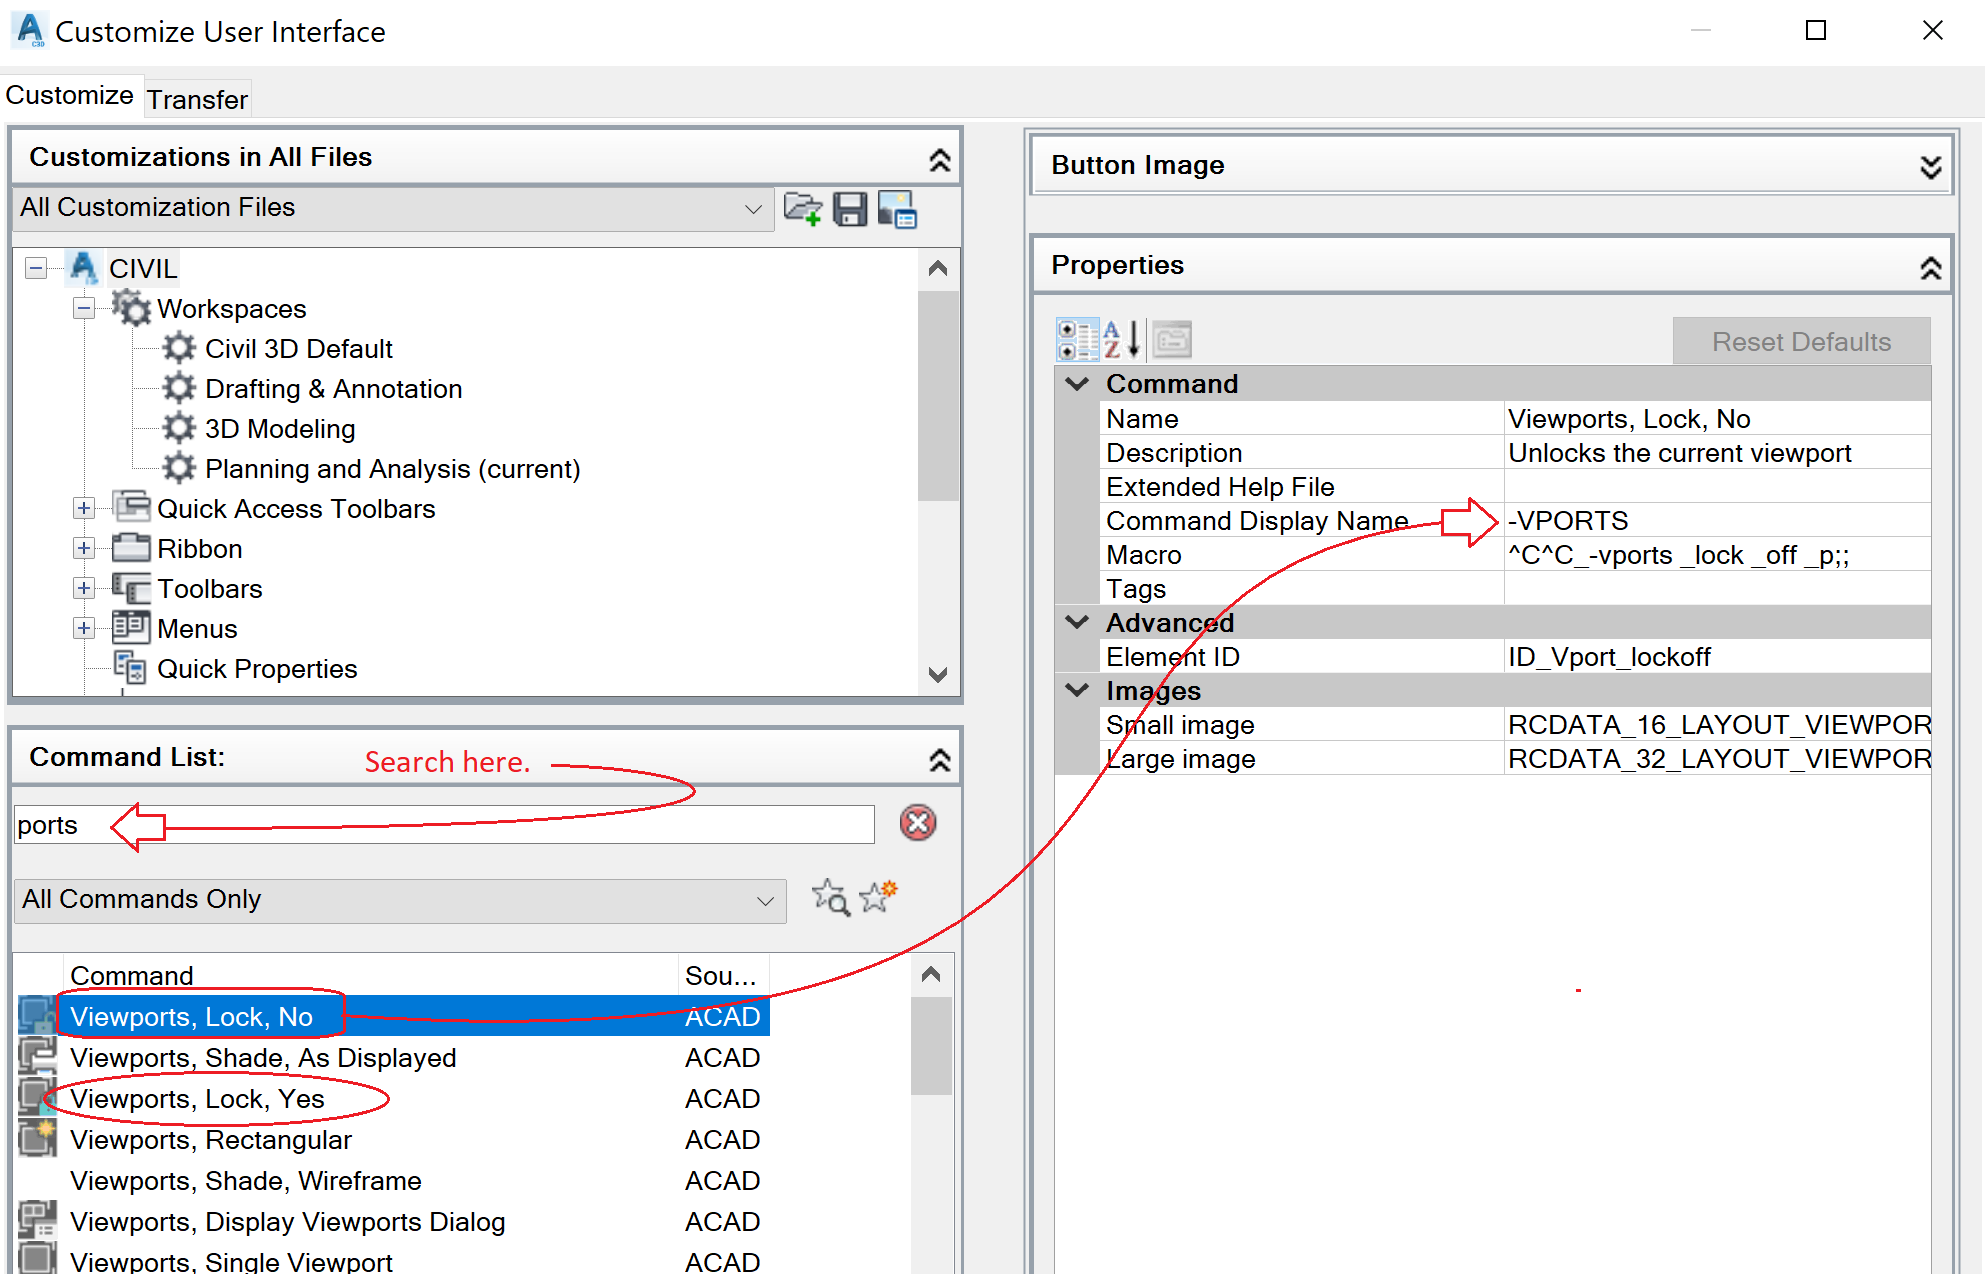 Viewports locked - keyboard shortcut - Autodesk Community- AutoCAD